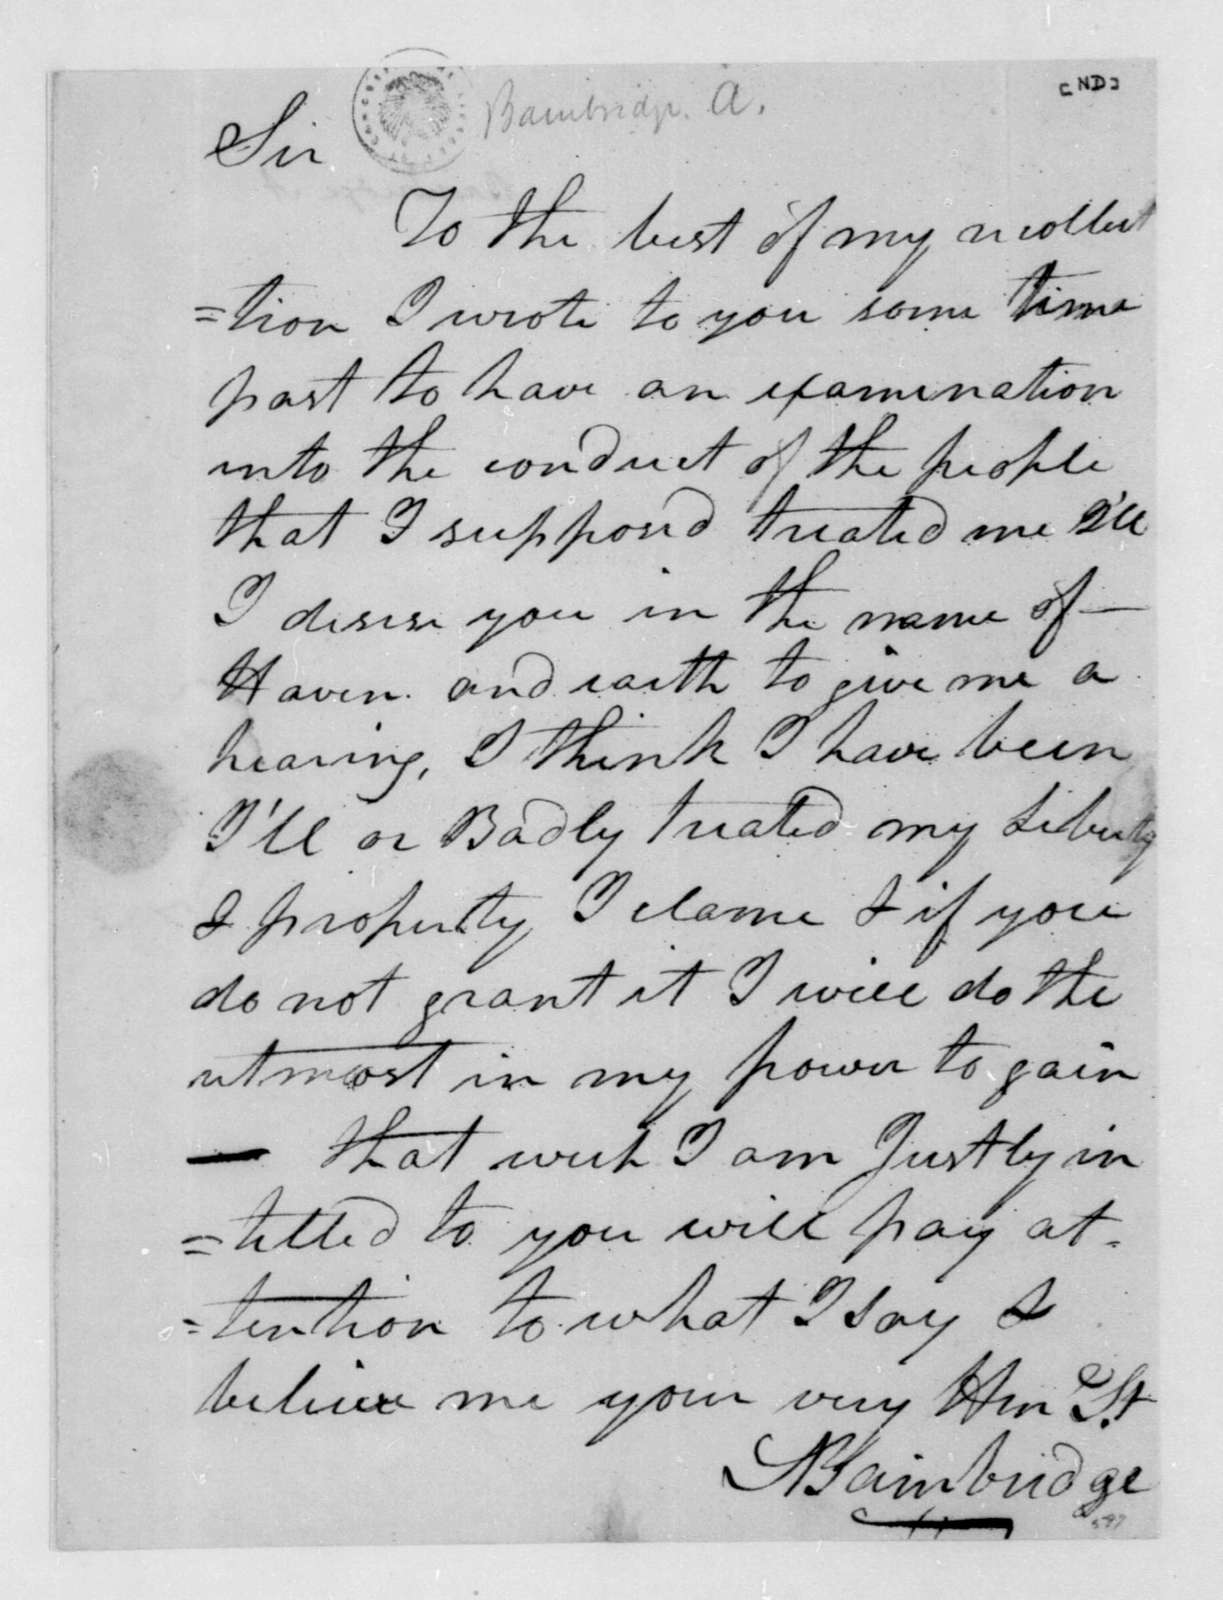 A. Bainbridge to James Madison. Hearing request.